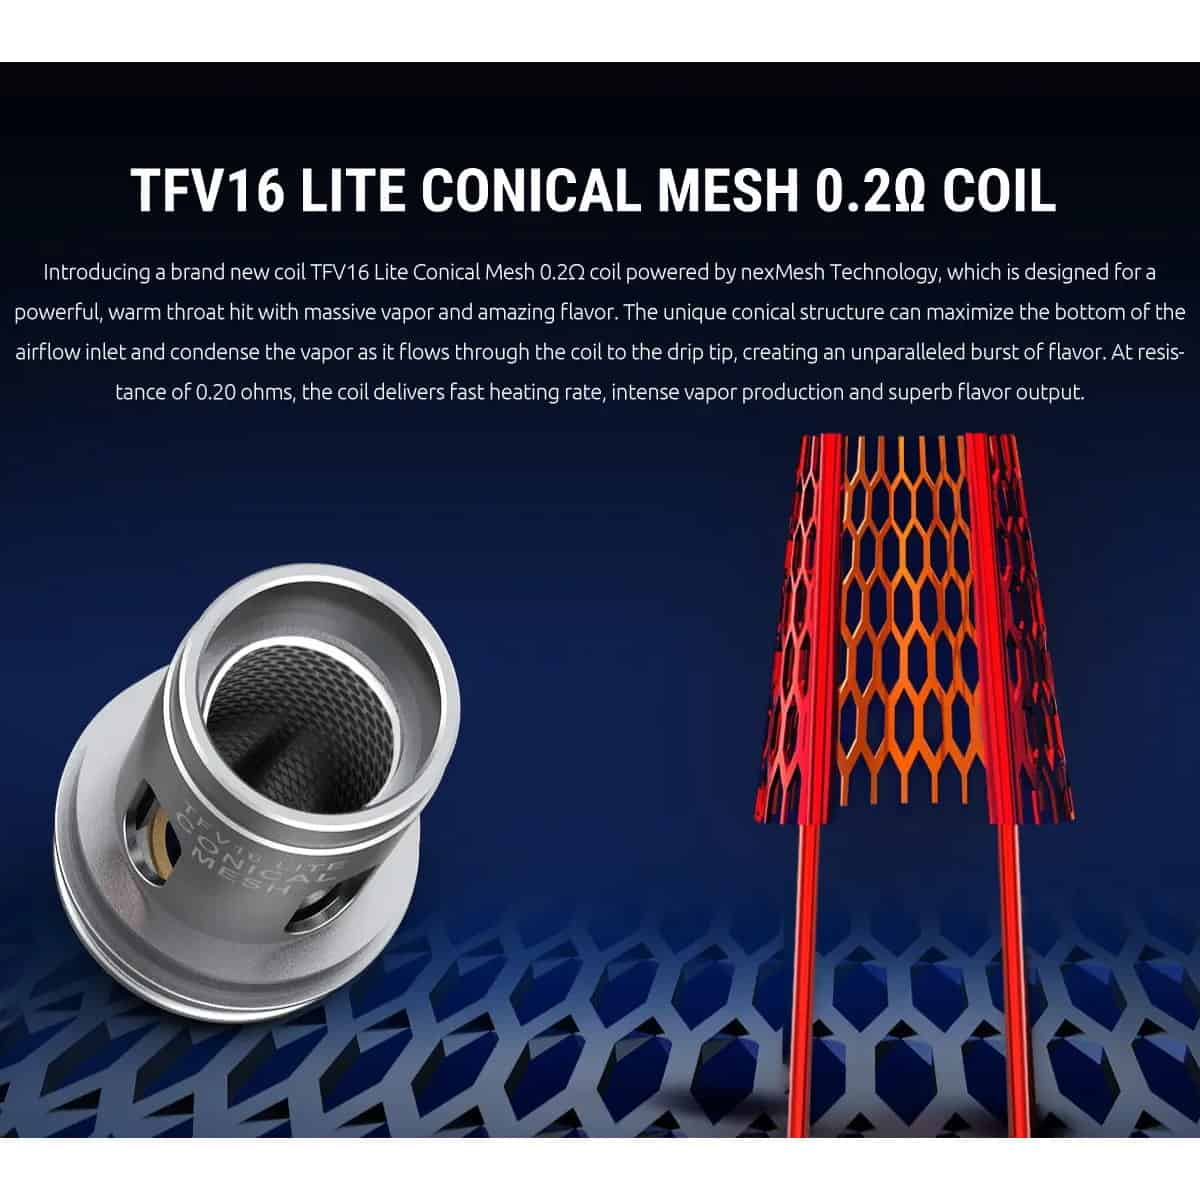 Smok Tfv16 Lite Conical Mesh Coil